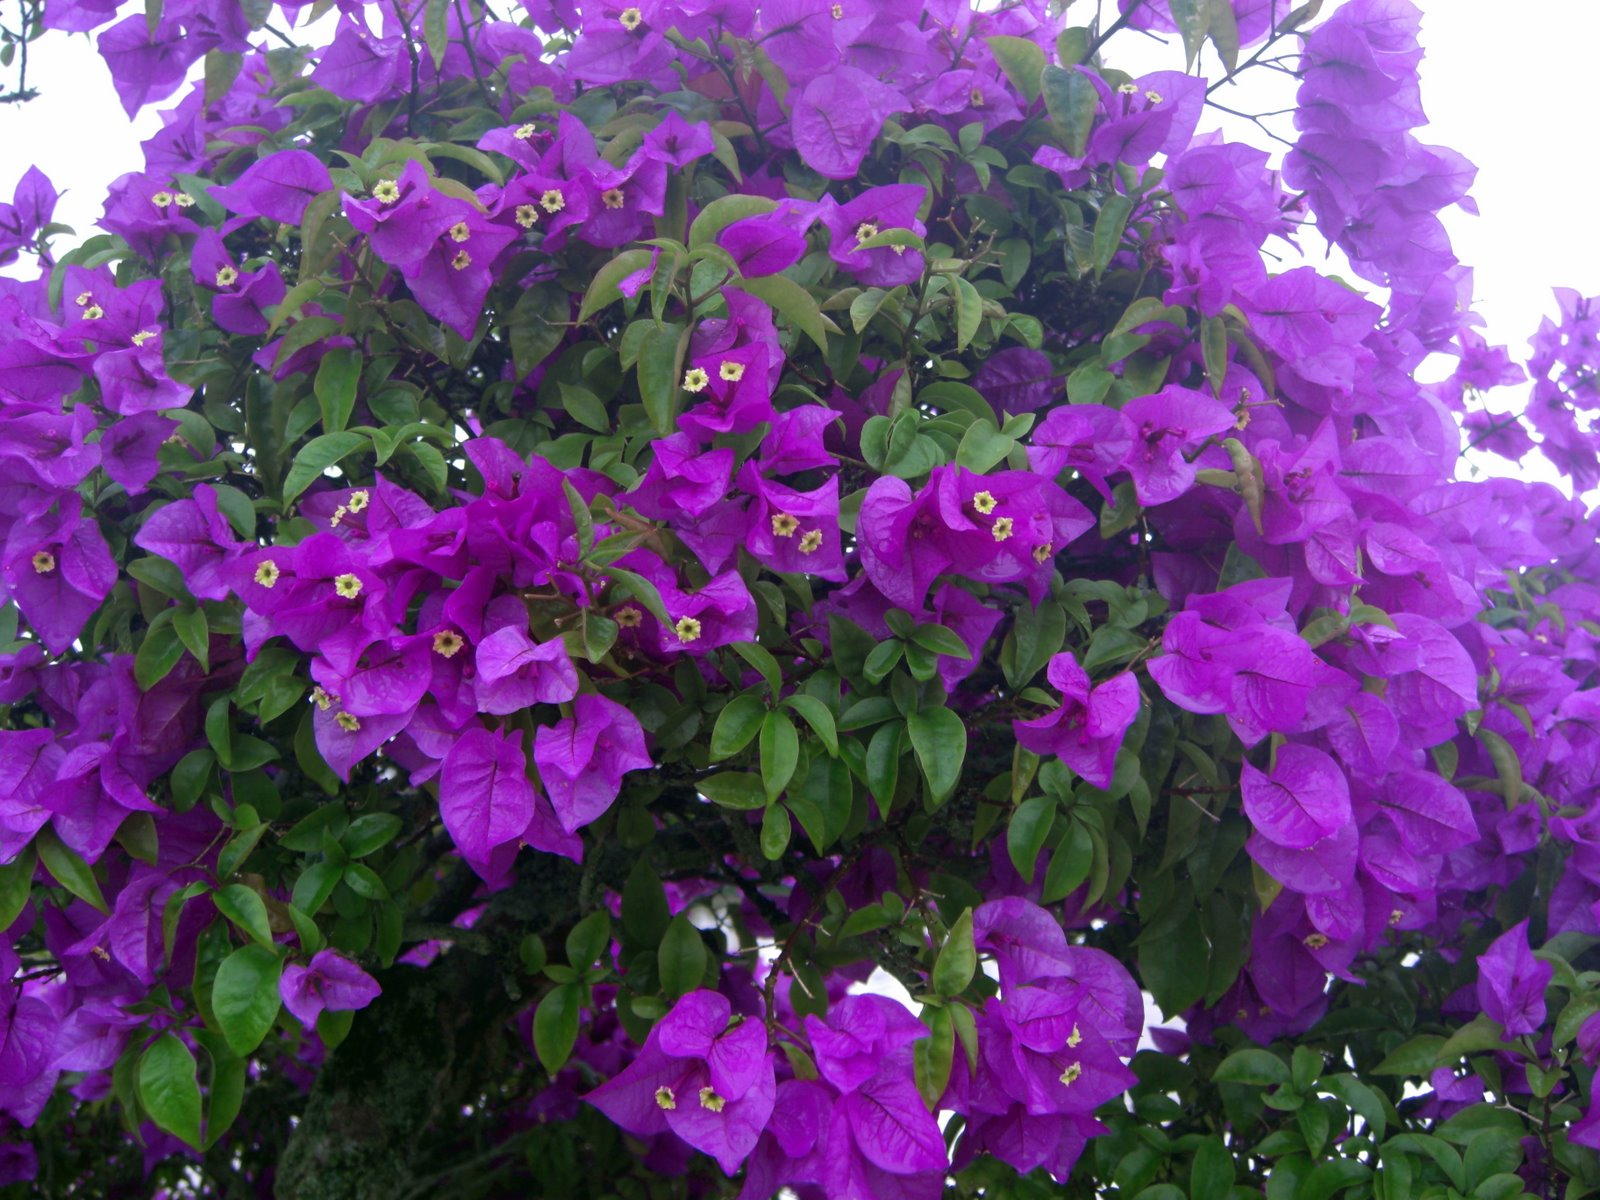 Purple Flowers Bush 28 Widescreen Wallpaper Hdflowerwallpaper